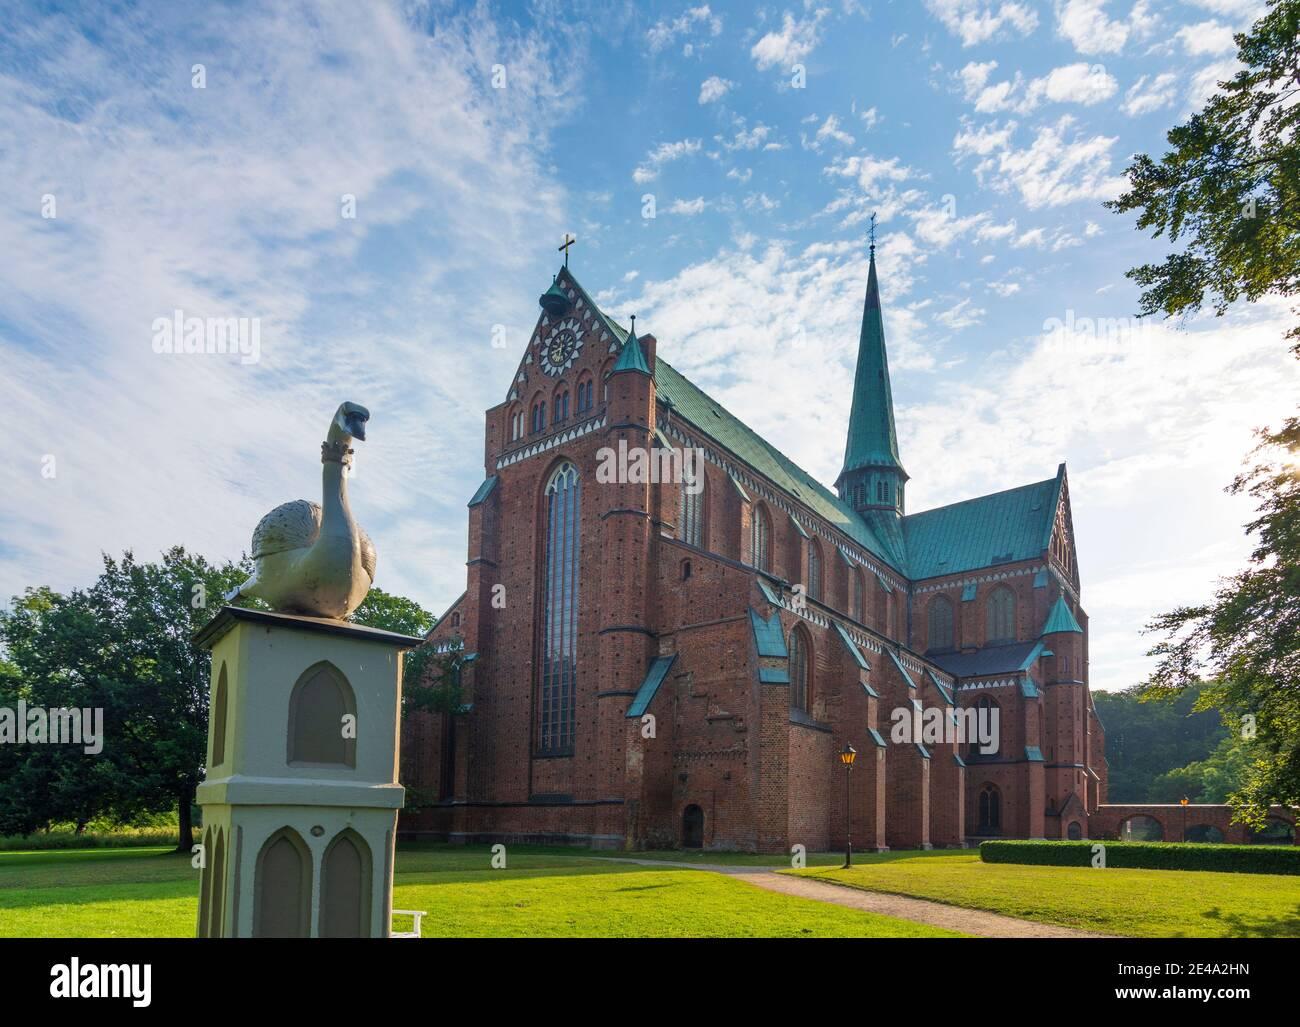 Bad Doberan, Doberan Abbey, church, Ostsee (Baltic Sea), Mecklenburg-Vorpommern / Mecklenburg-Western Pomerania, Germany Stock Photo